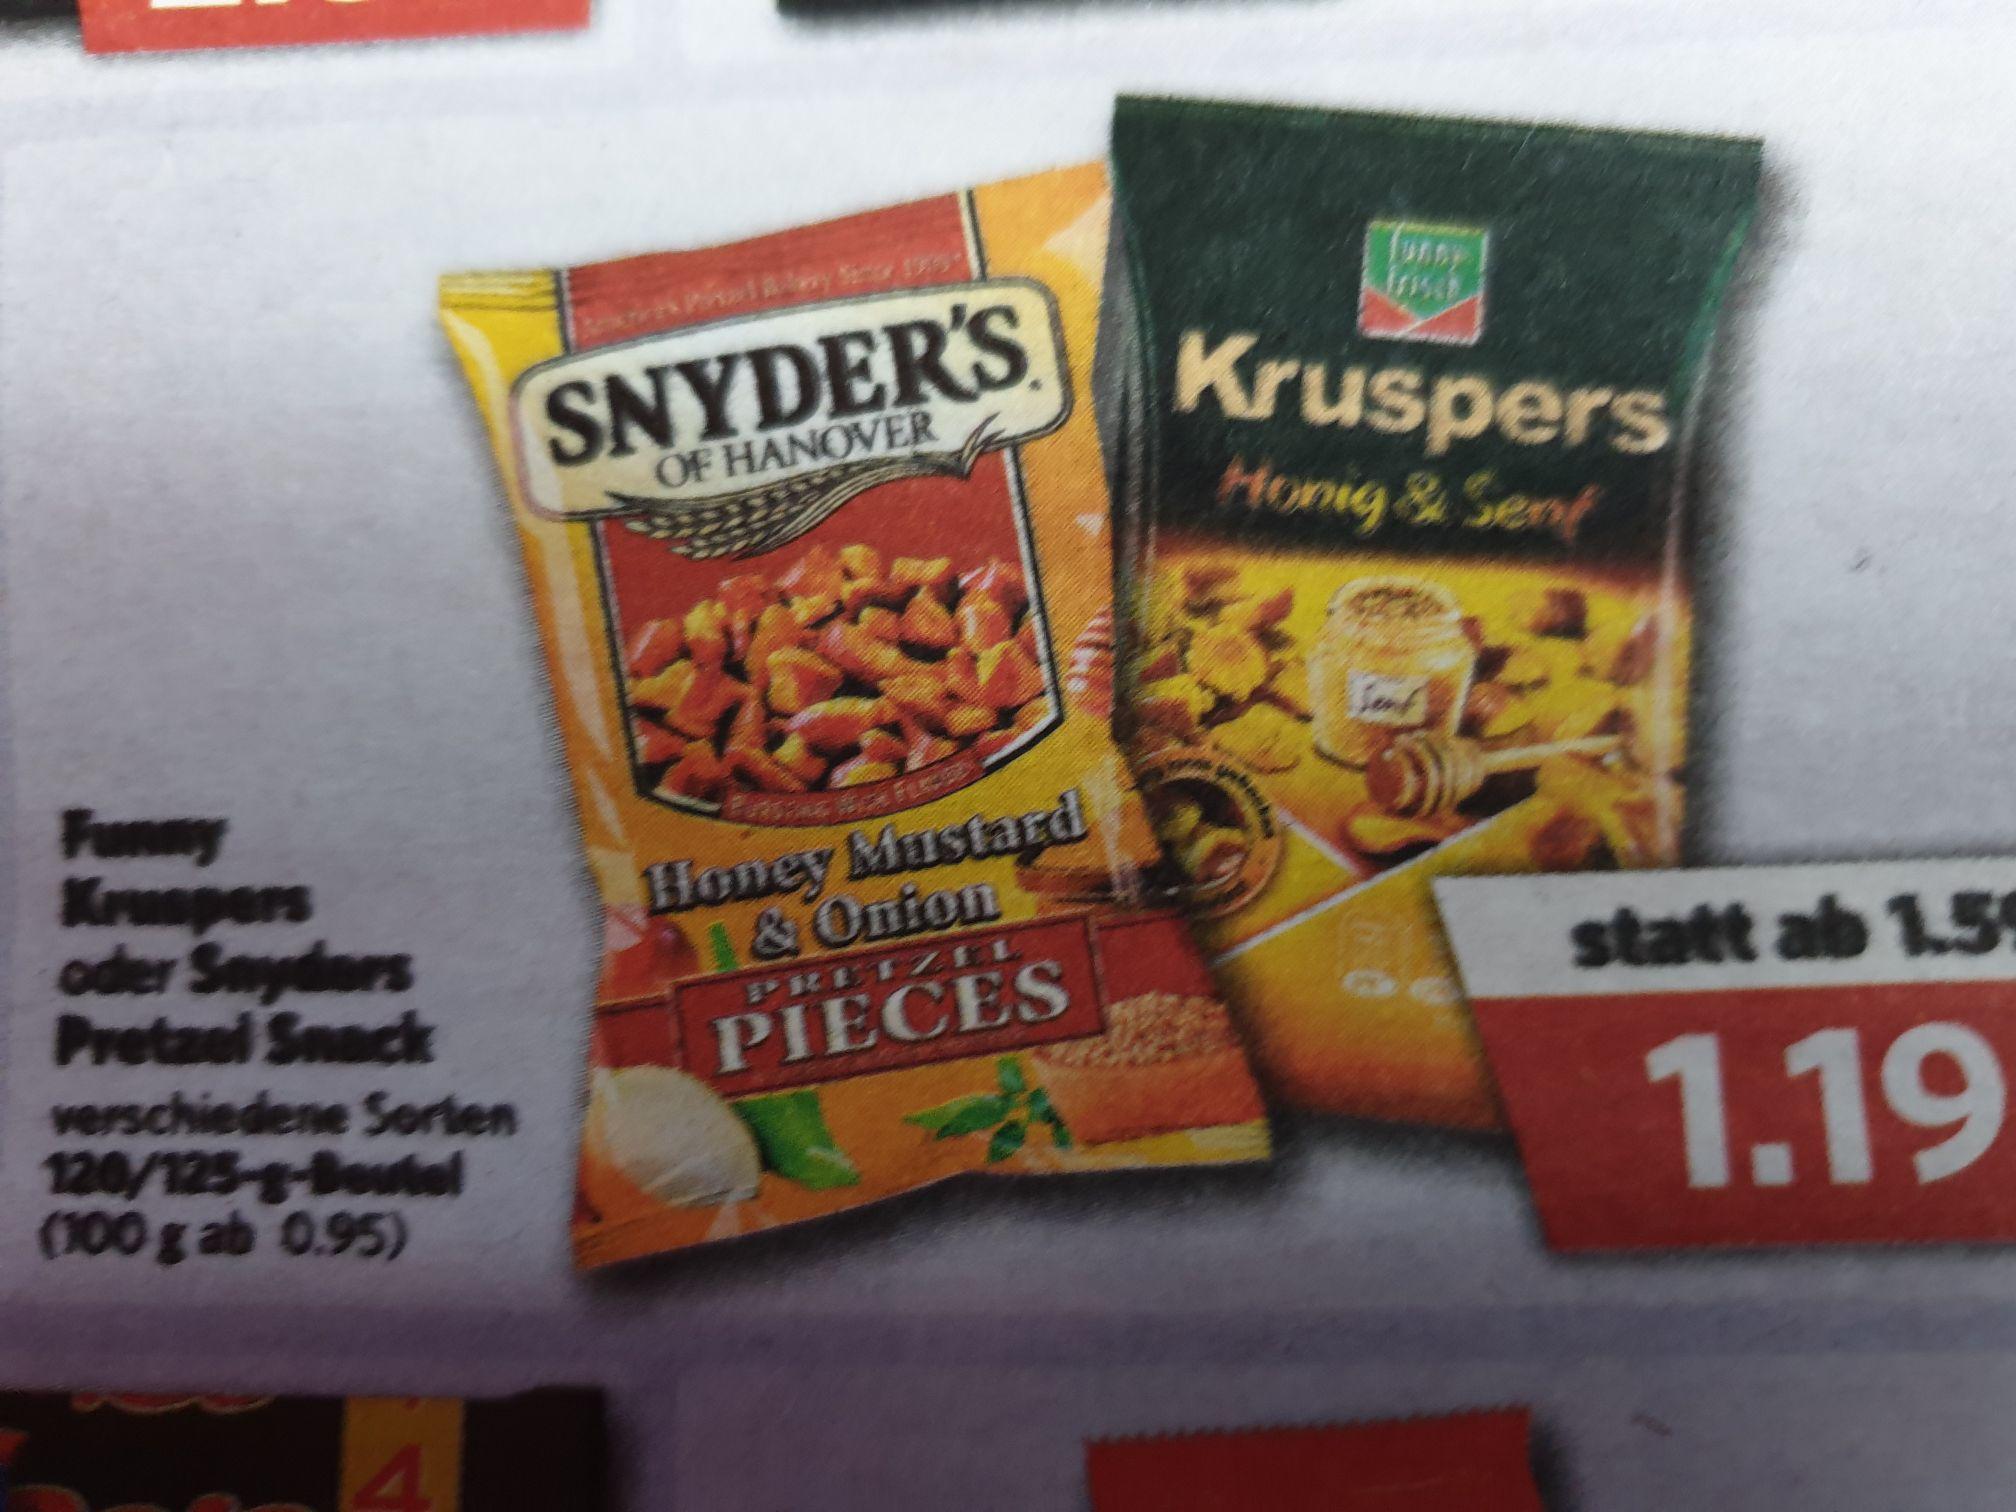 LOKAL (Combi-/Jibi-Markt) Snyders of Hanover Pretzel Snack für 1,19€